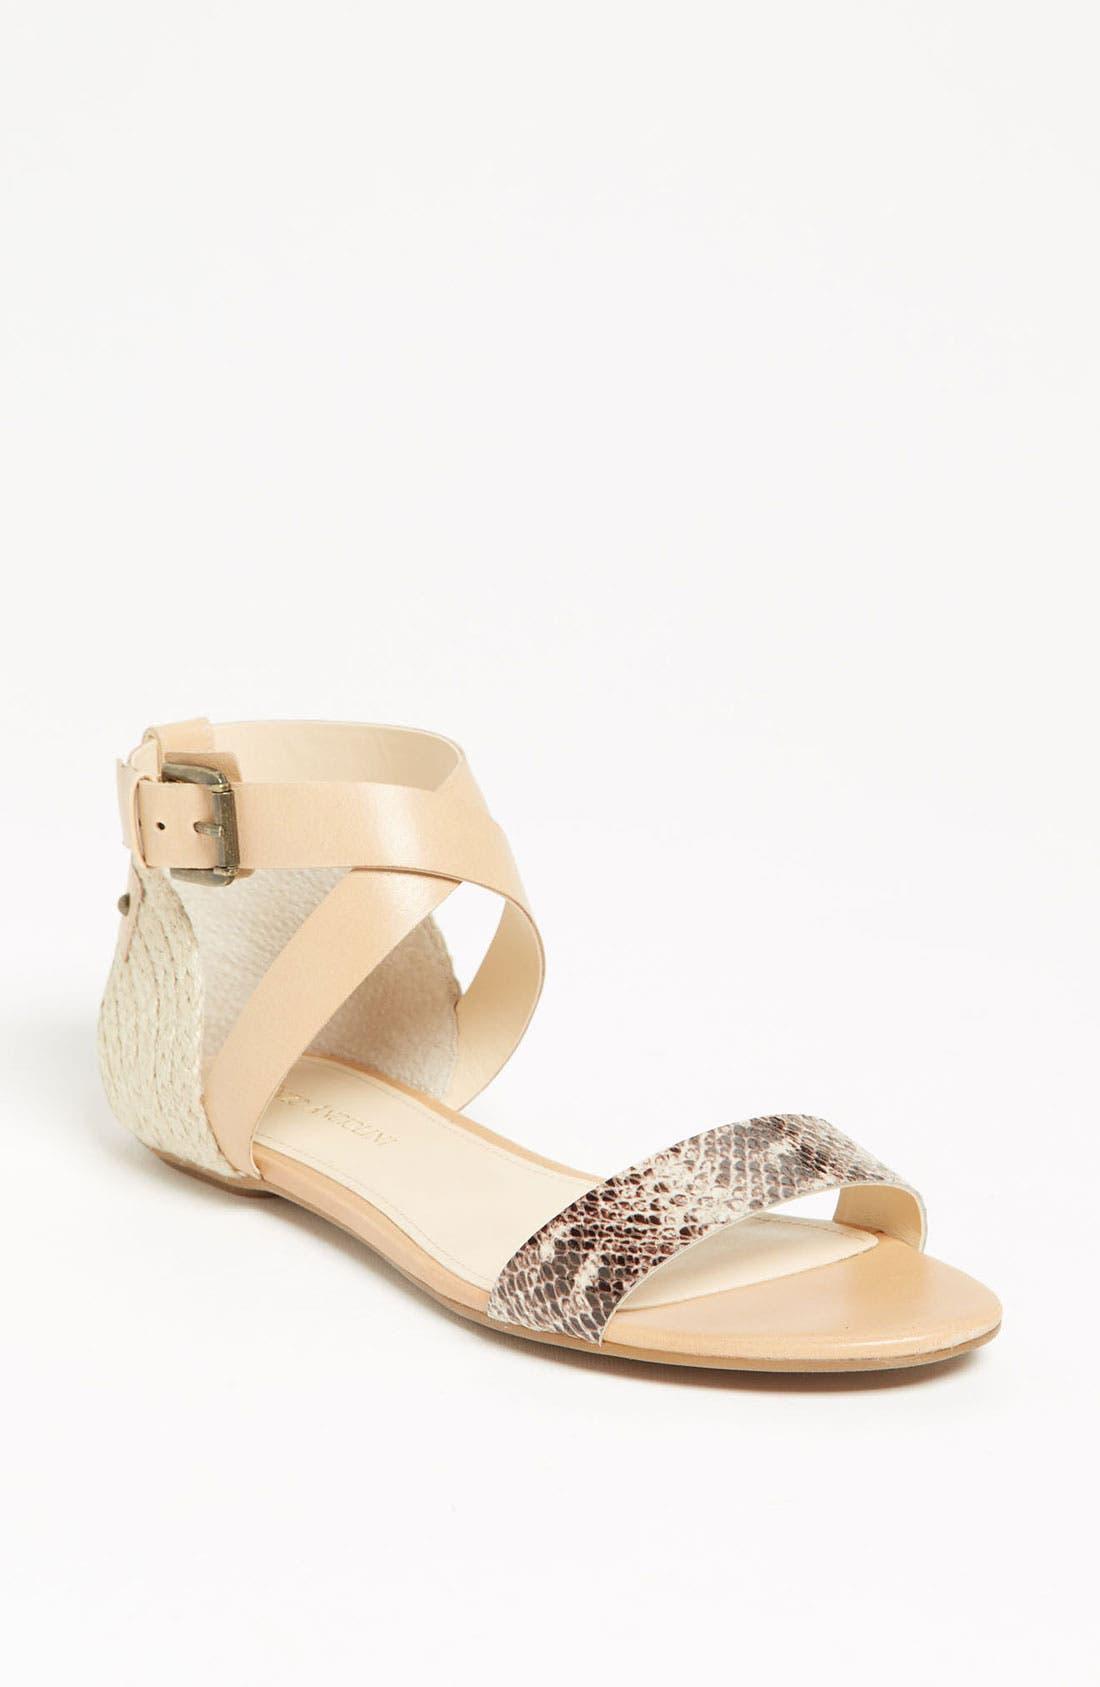 ENZO ANGIOLINI 'Katira' Sandal, Main, color, 250